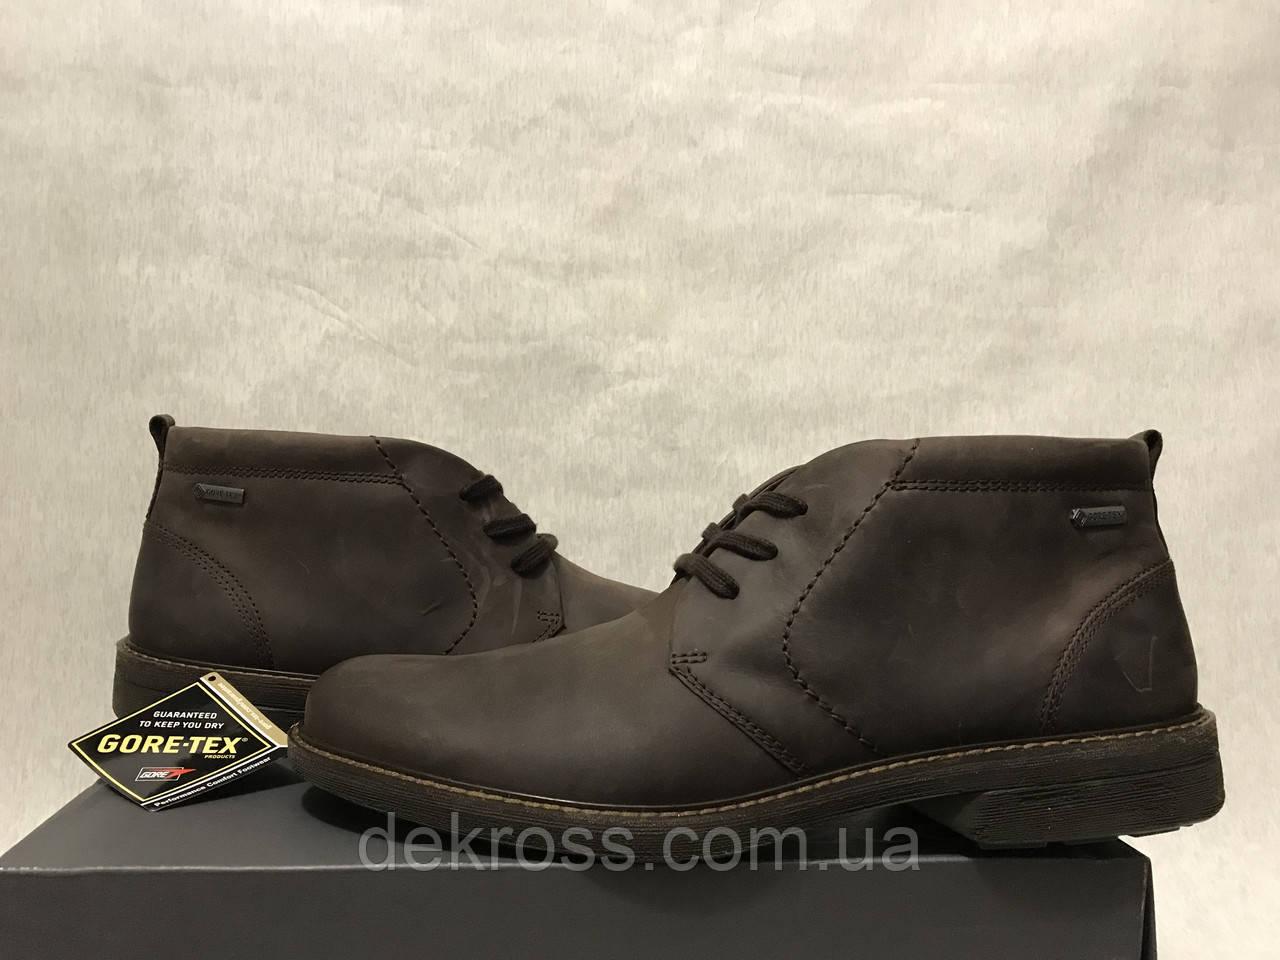 Ботинки Ecco Turn Moka Gore-Tex (45) Оригинал 510224